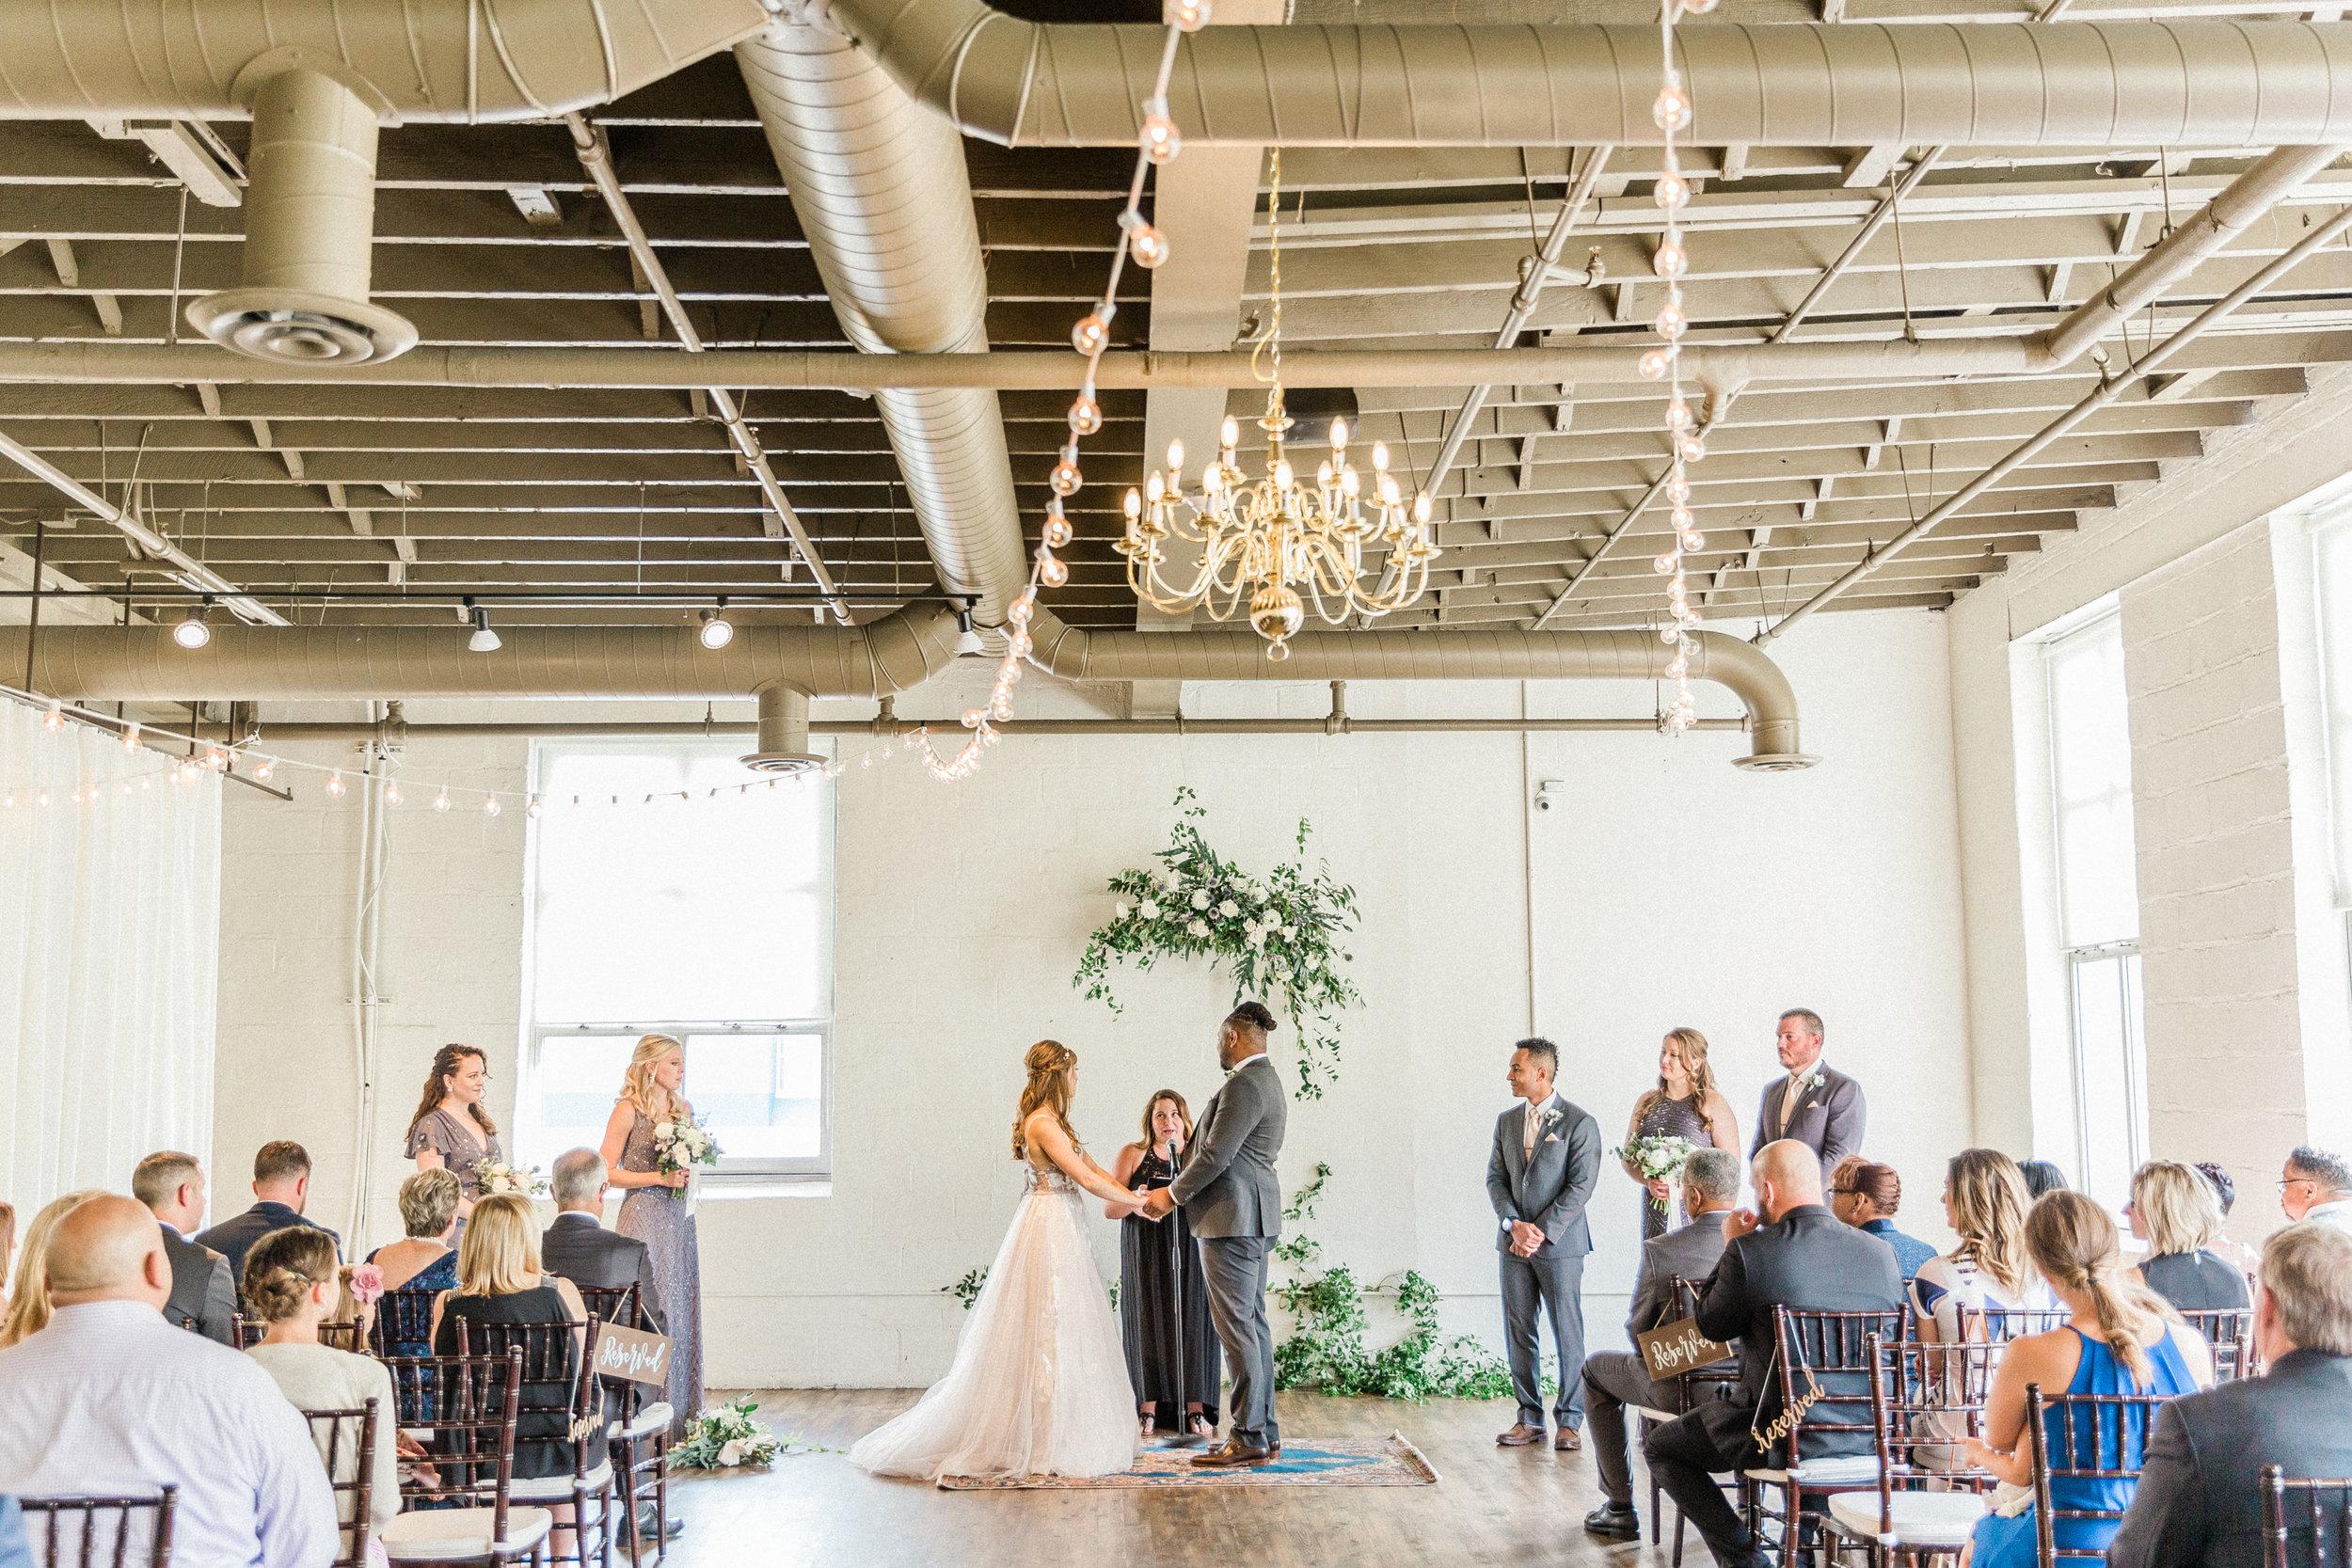 Mallory and Aaron - Married - Sneaks - Lauren Alisse Photography-44.jpg